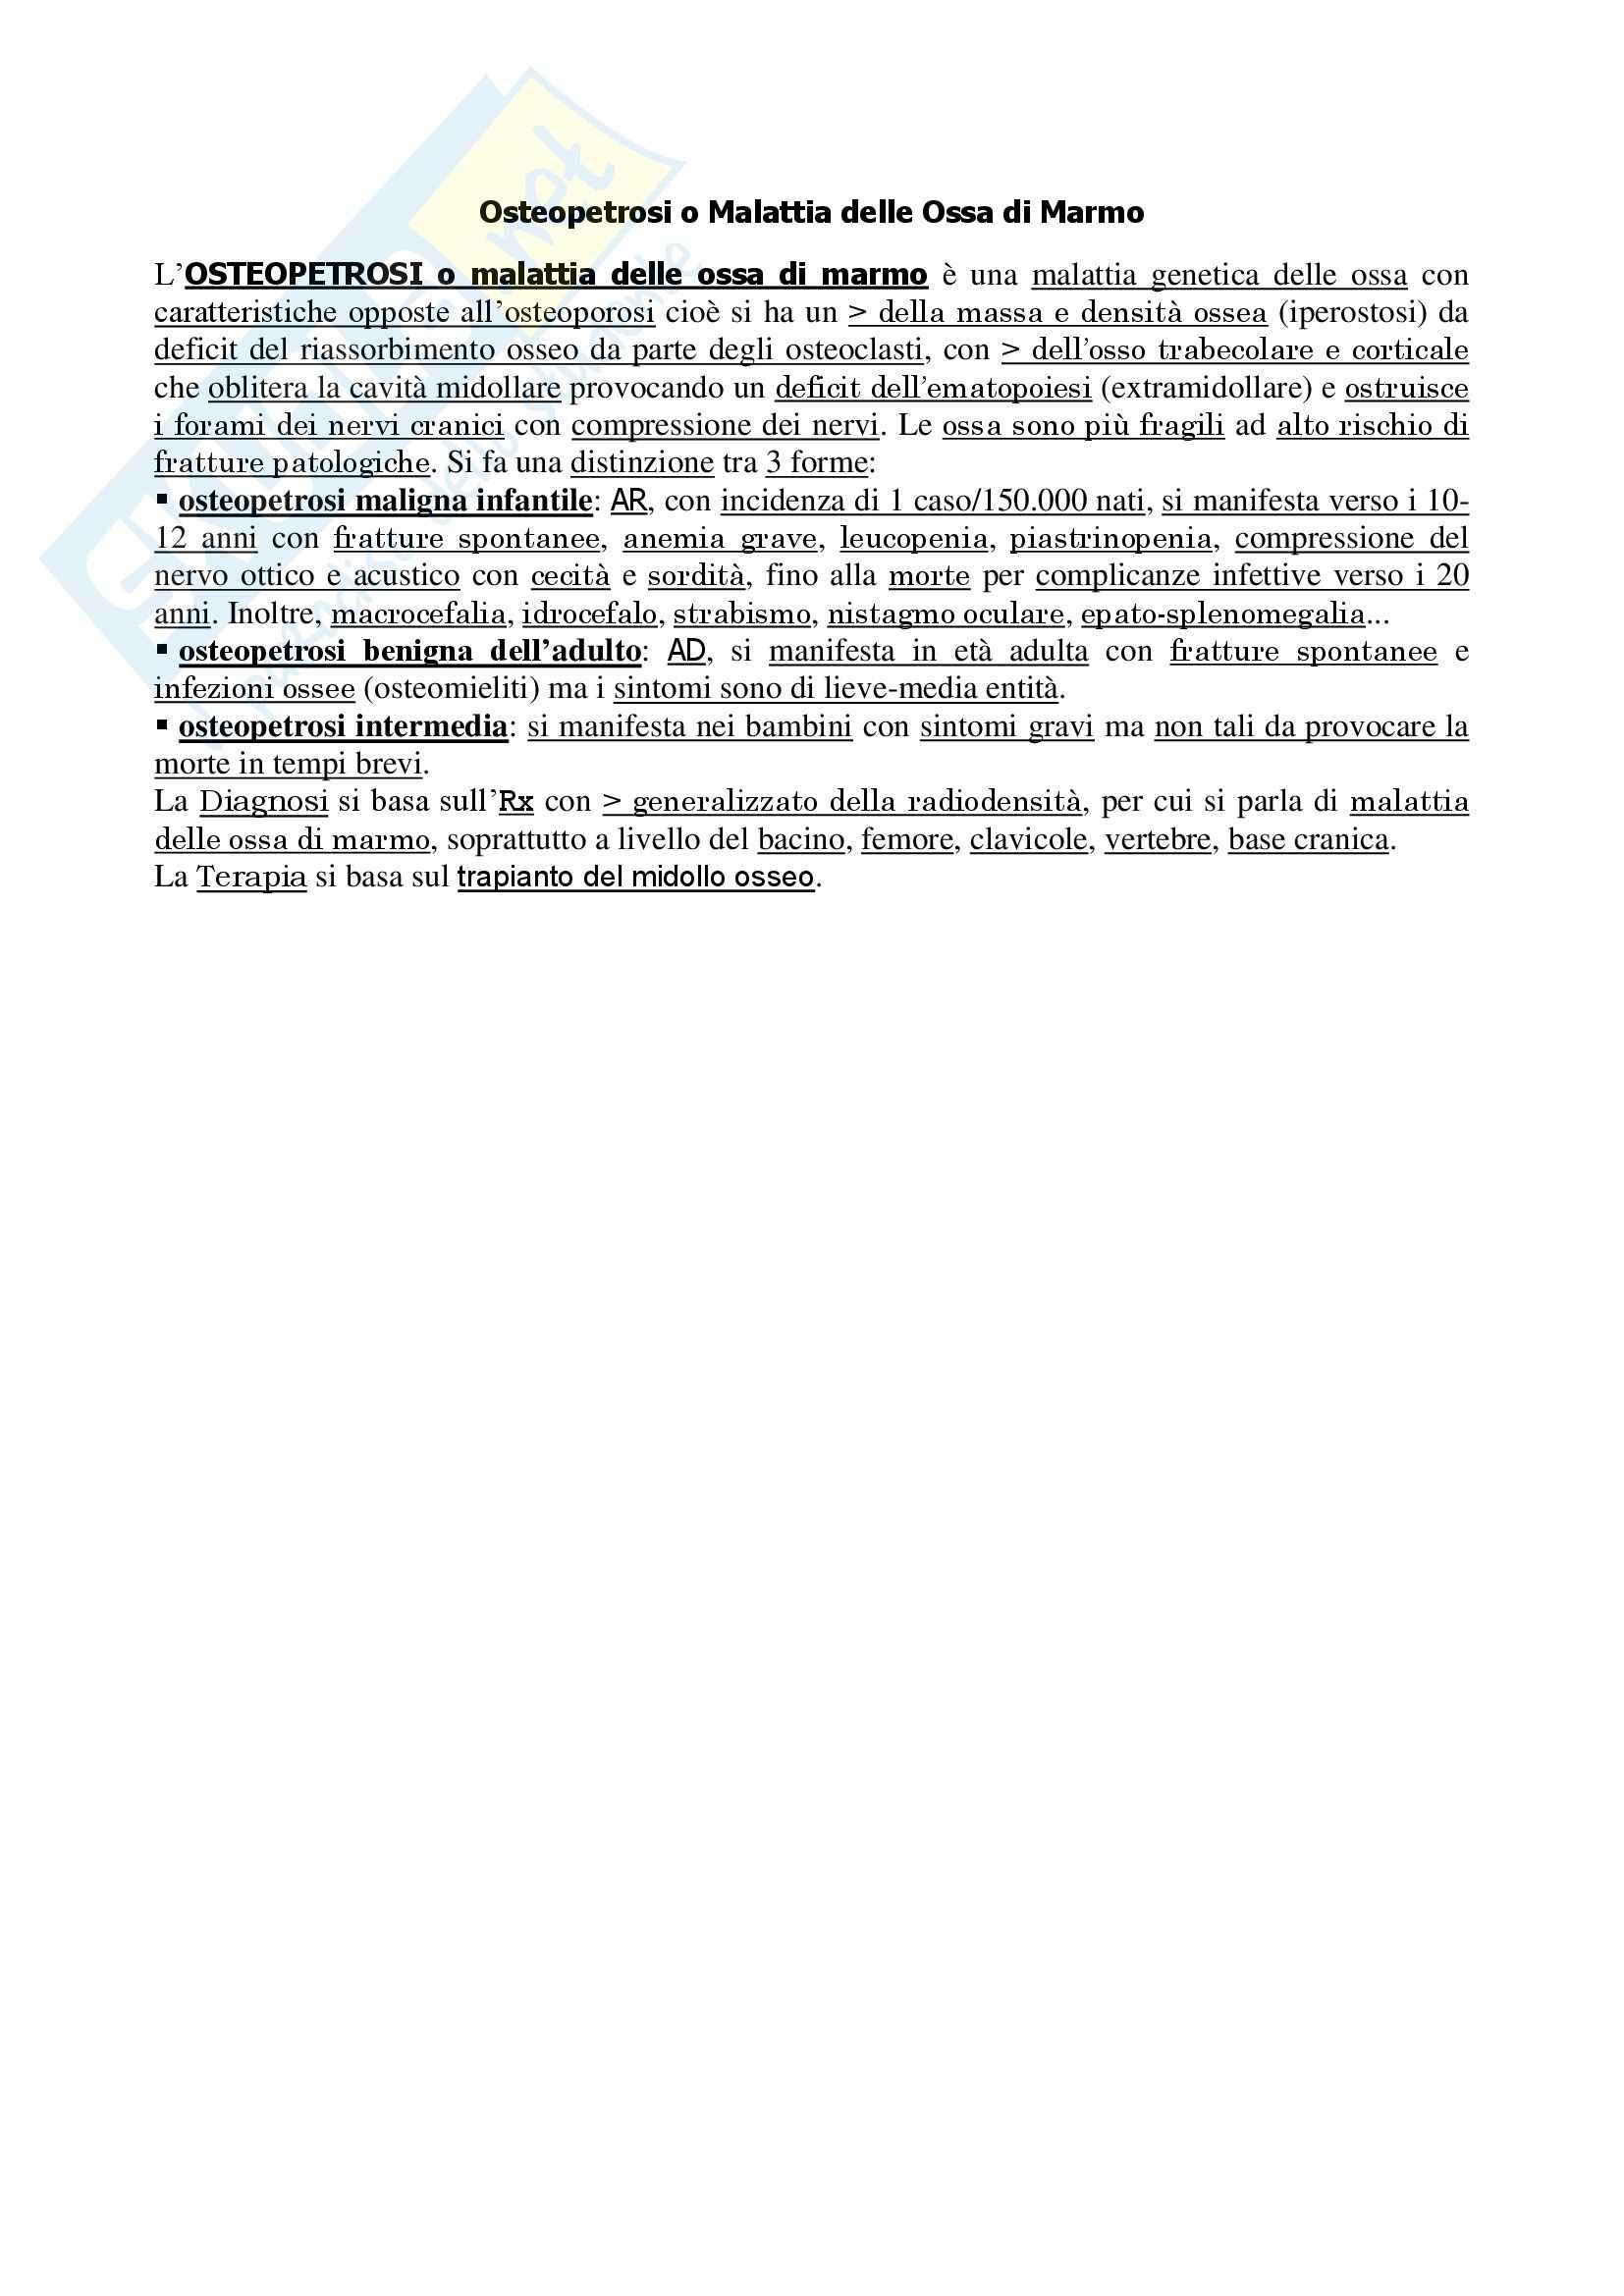 Reumatologia - Approfondimenti Pag. 6